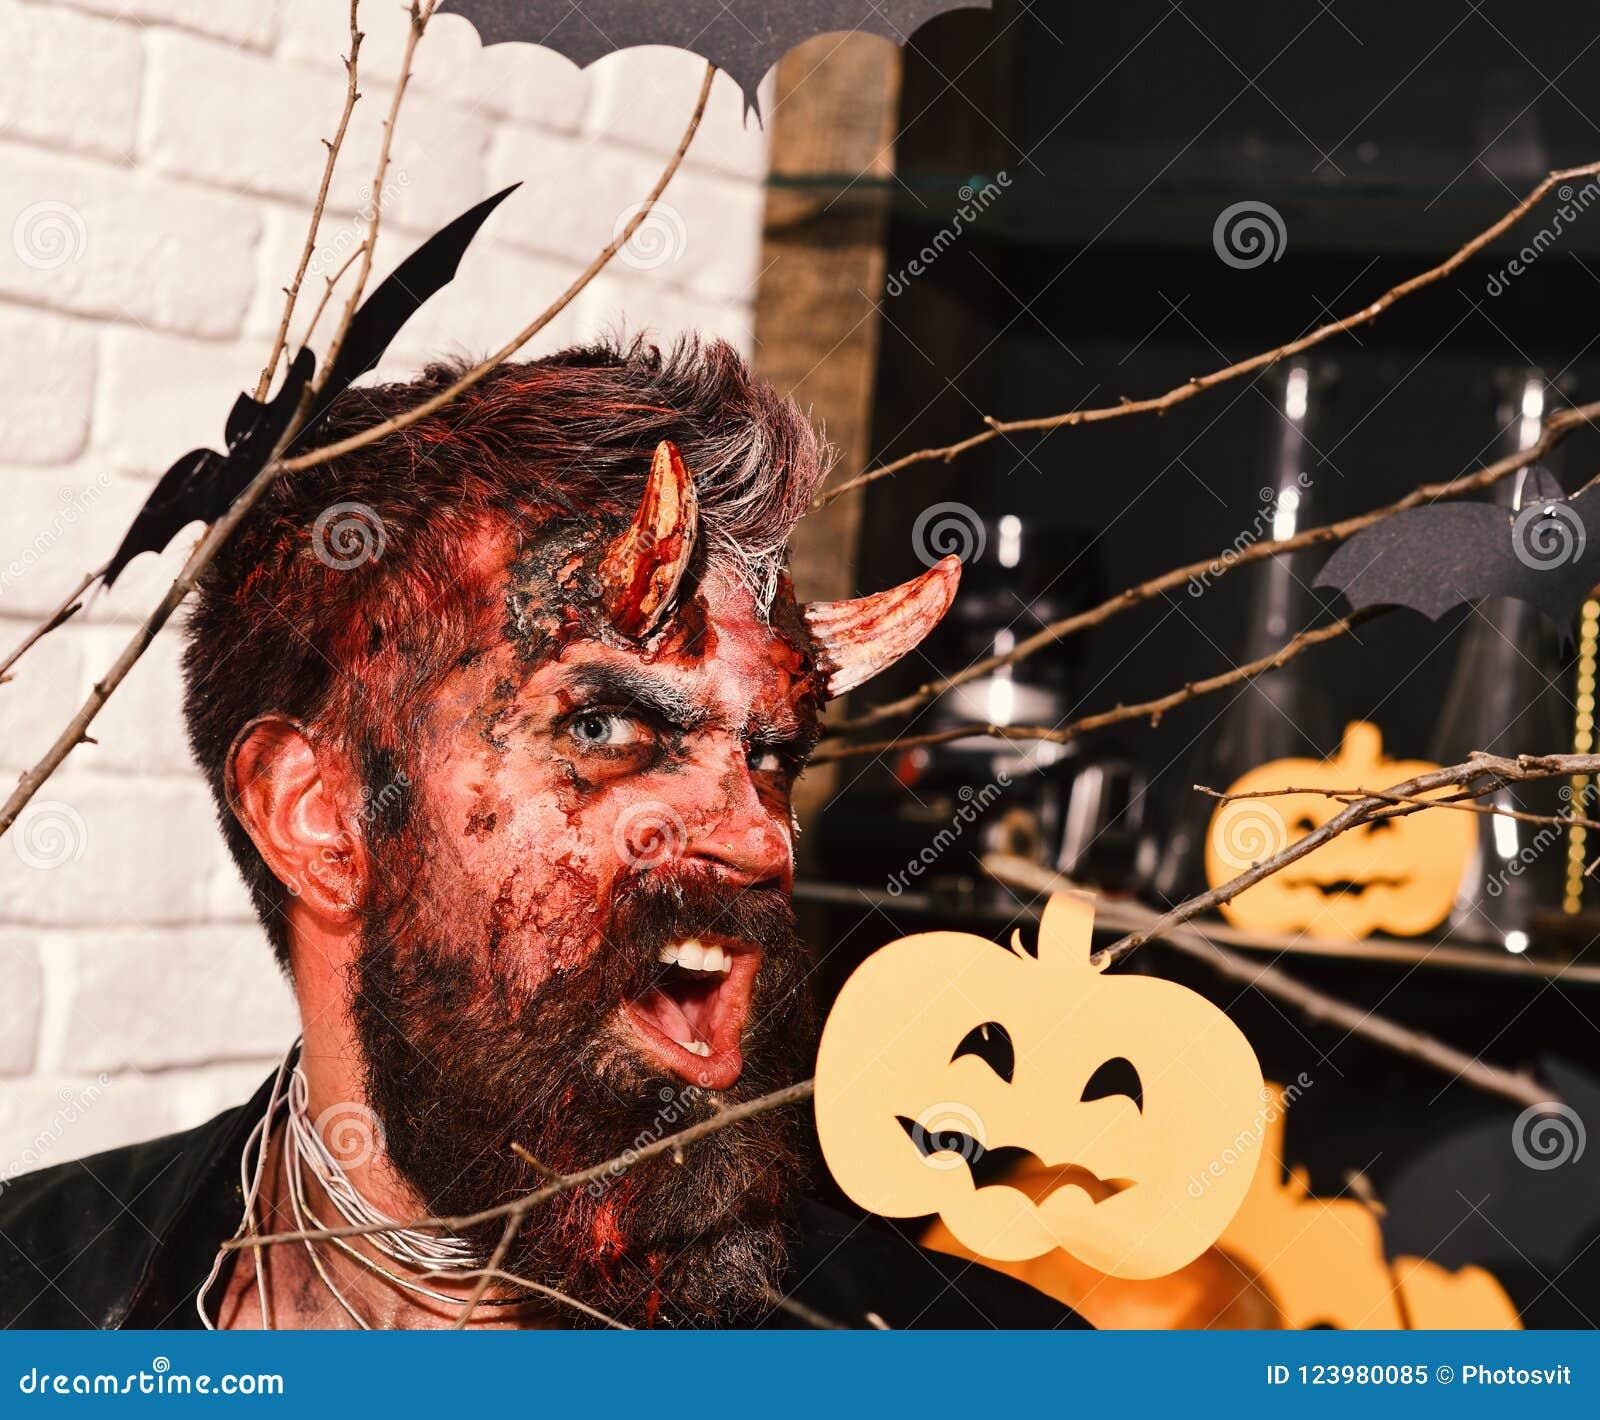 man wearing scary makeup with halloween pumpkins and bats decor